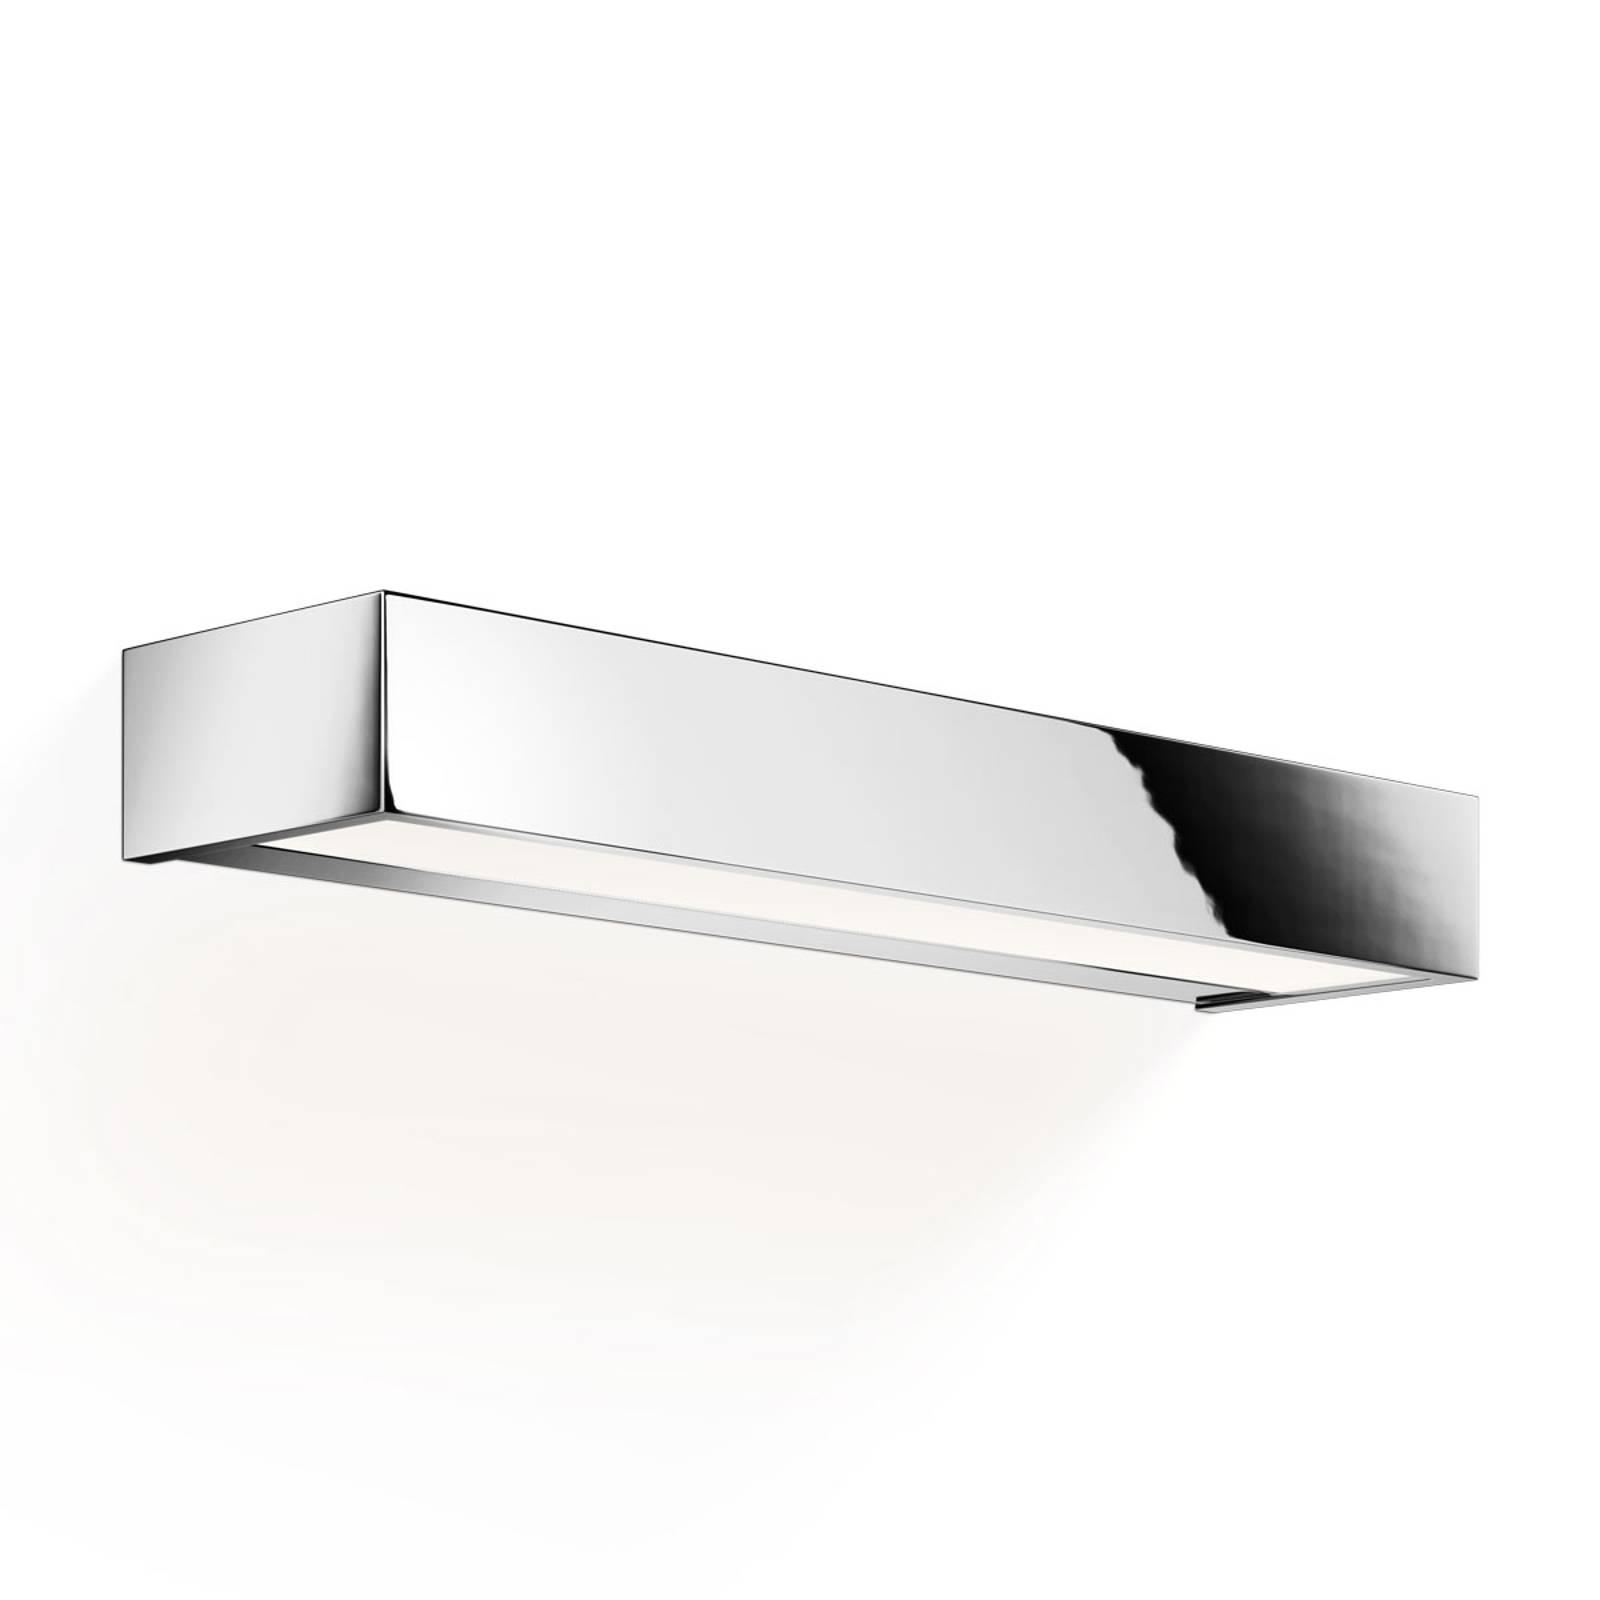 Decor Walther Box 40 N LED wandlamp 3.000 K